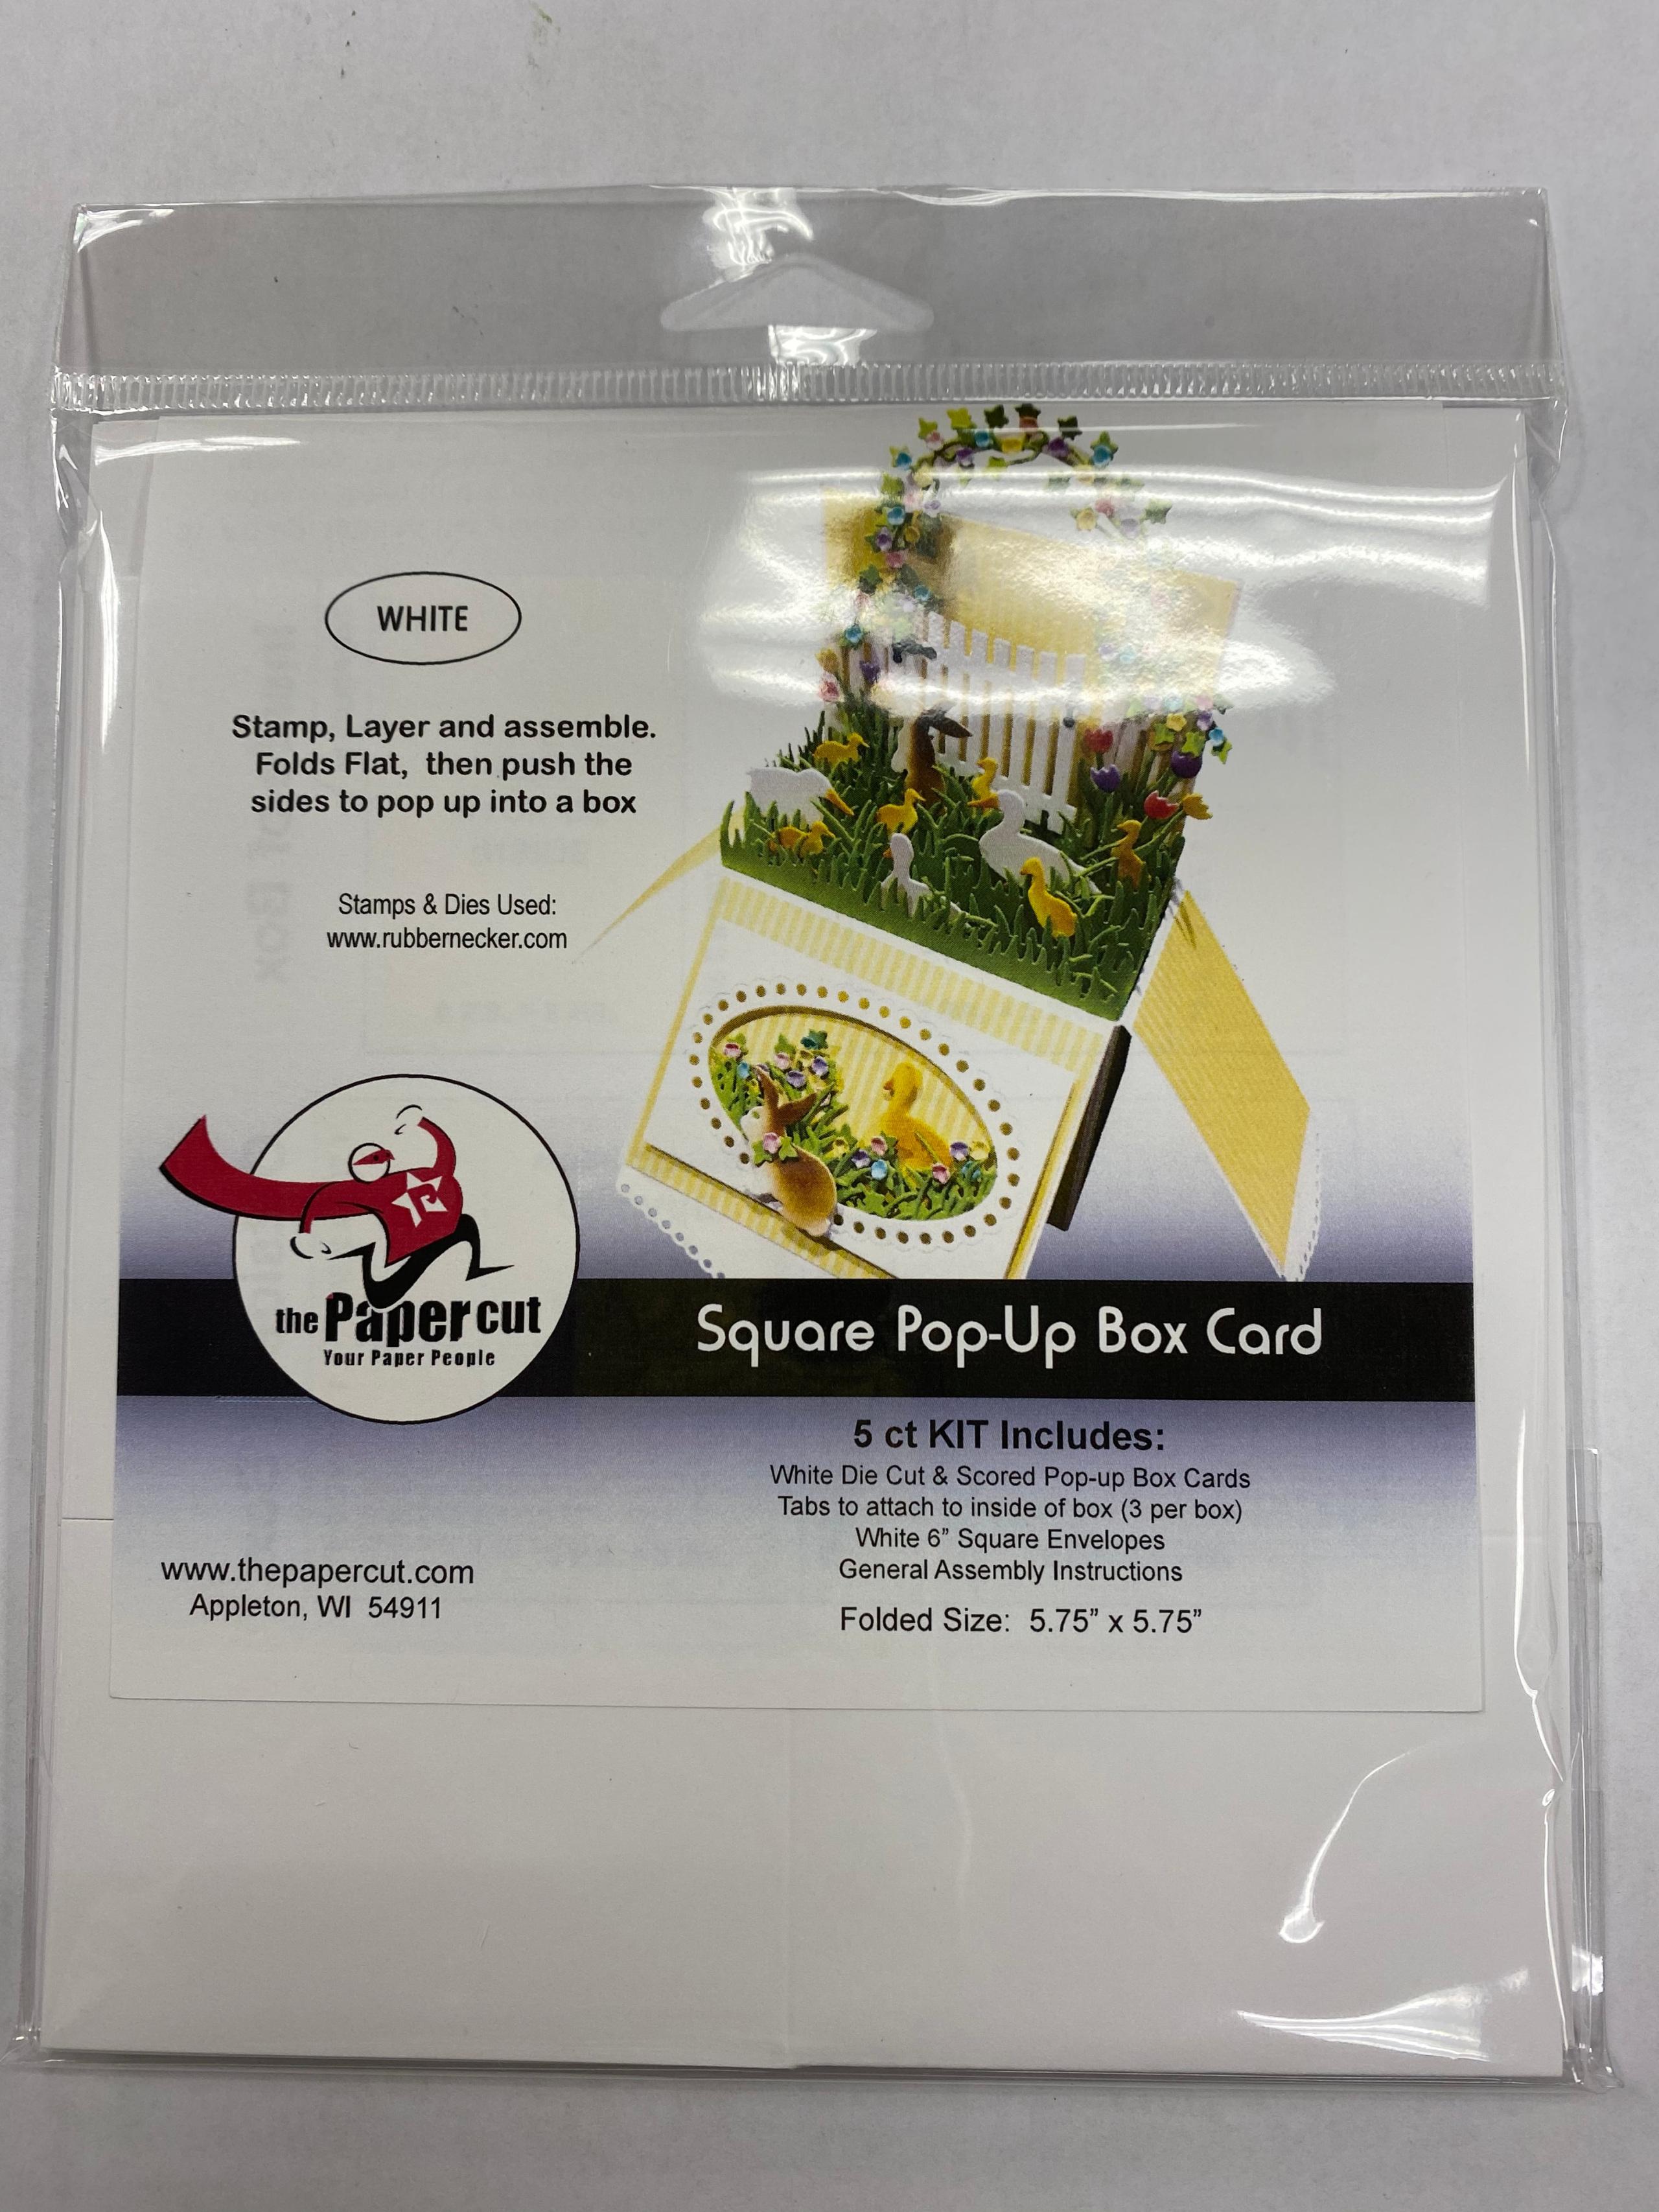 PC - Square Pop-Up Box Card